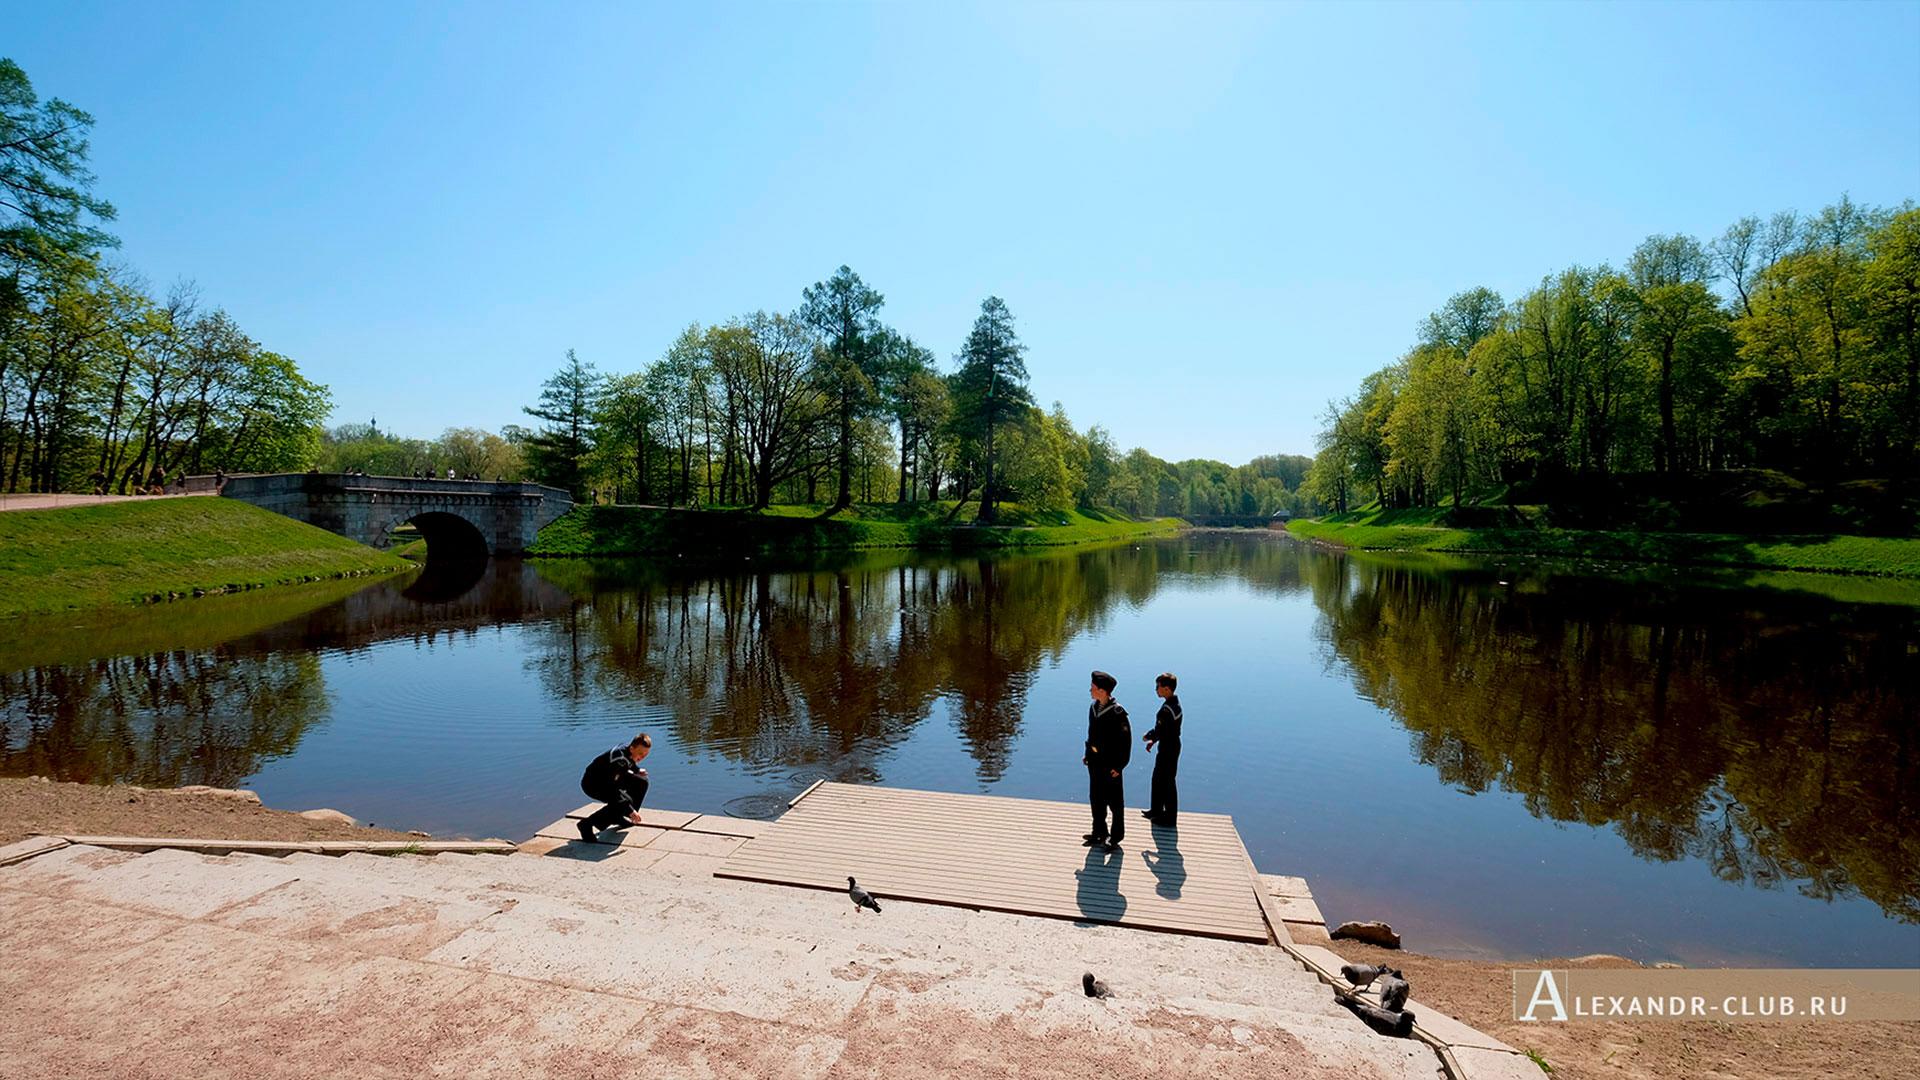 Гатчинский парк, весна, Карпин пруд